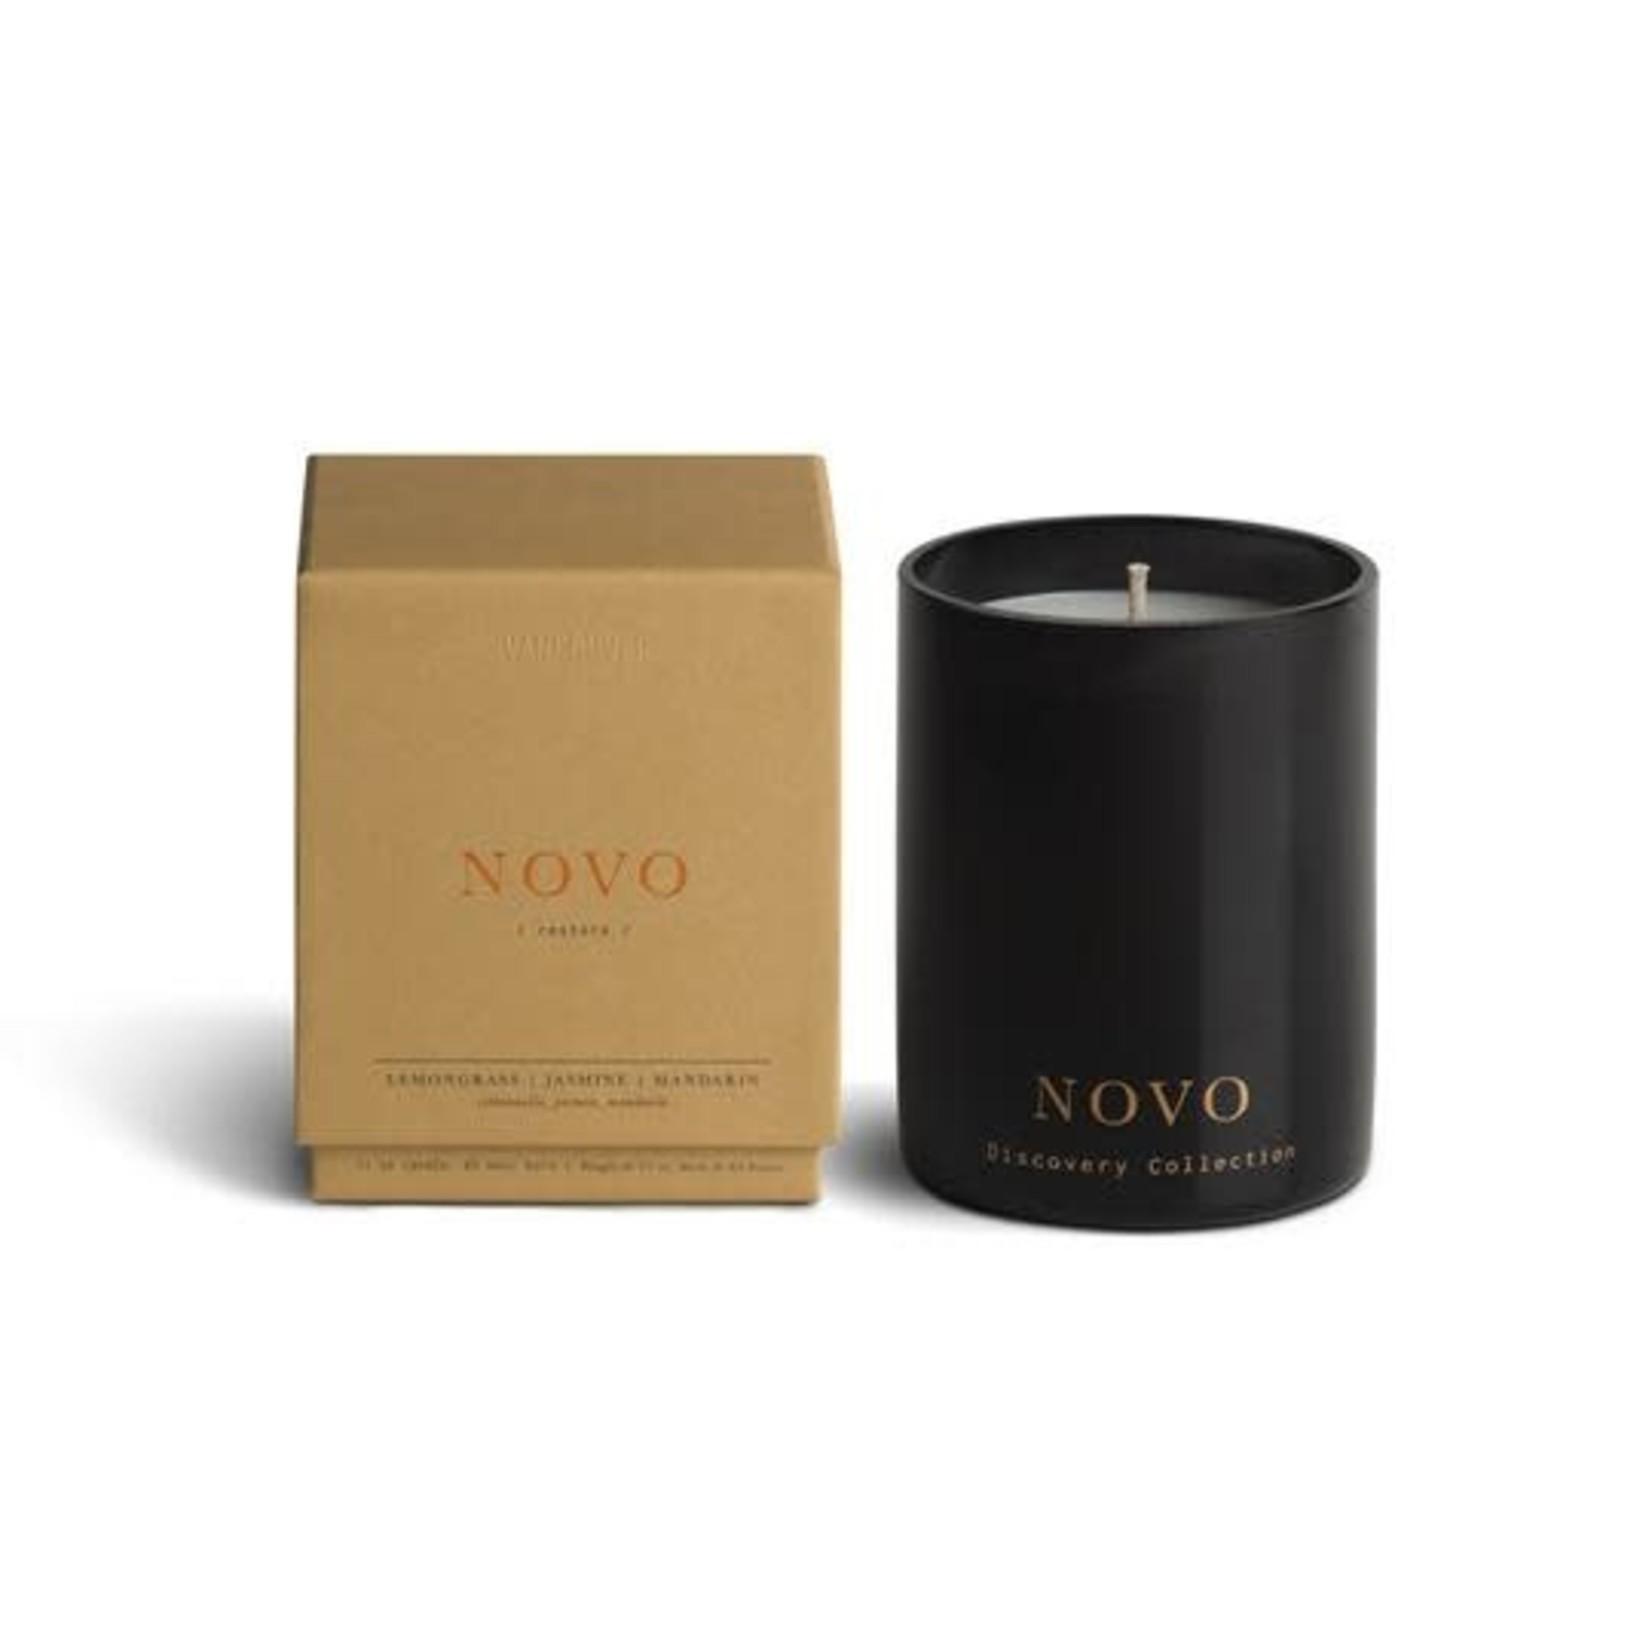 Vancouver Candle Co. VANCOUVER - bougie NOVO